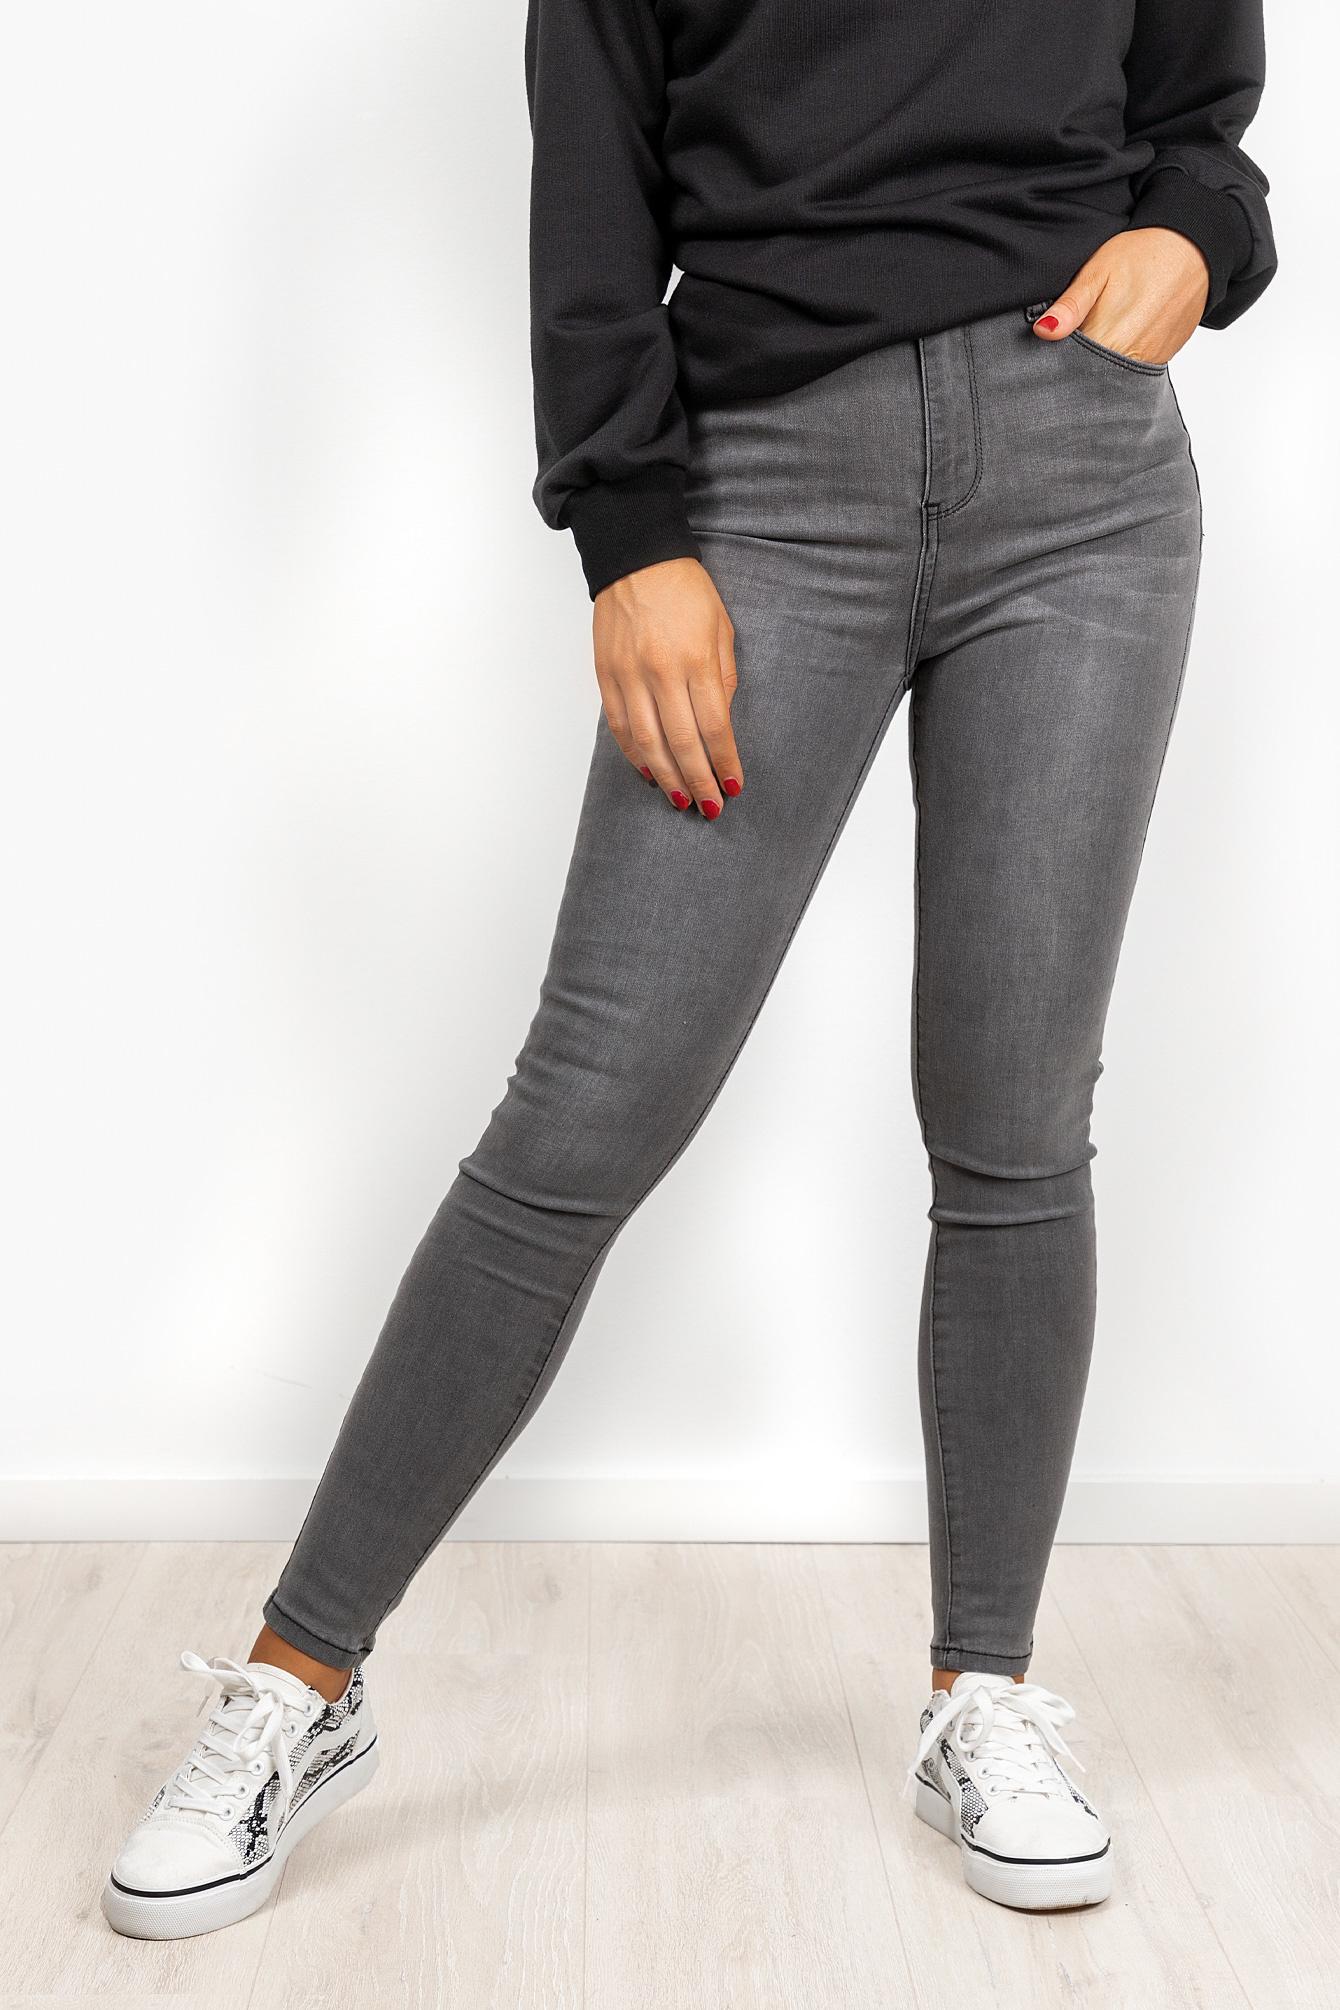 Denim jeans Joelle lichtgrijs